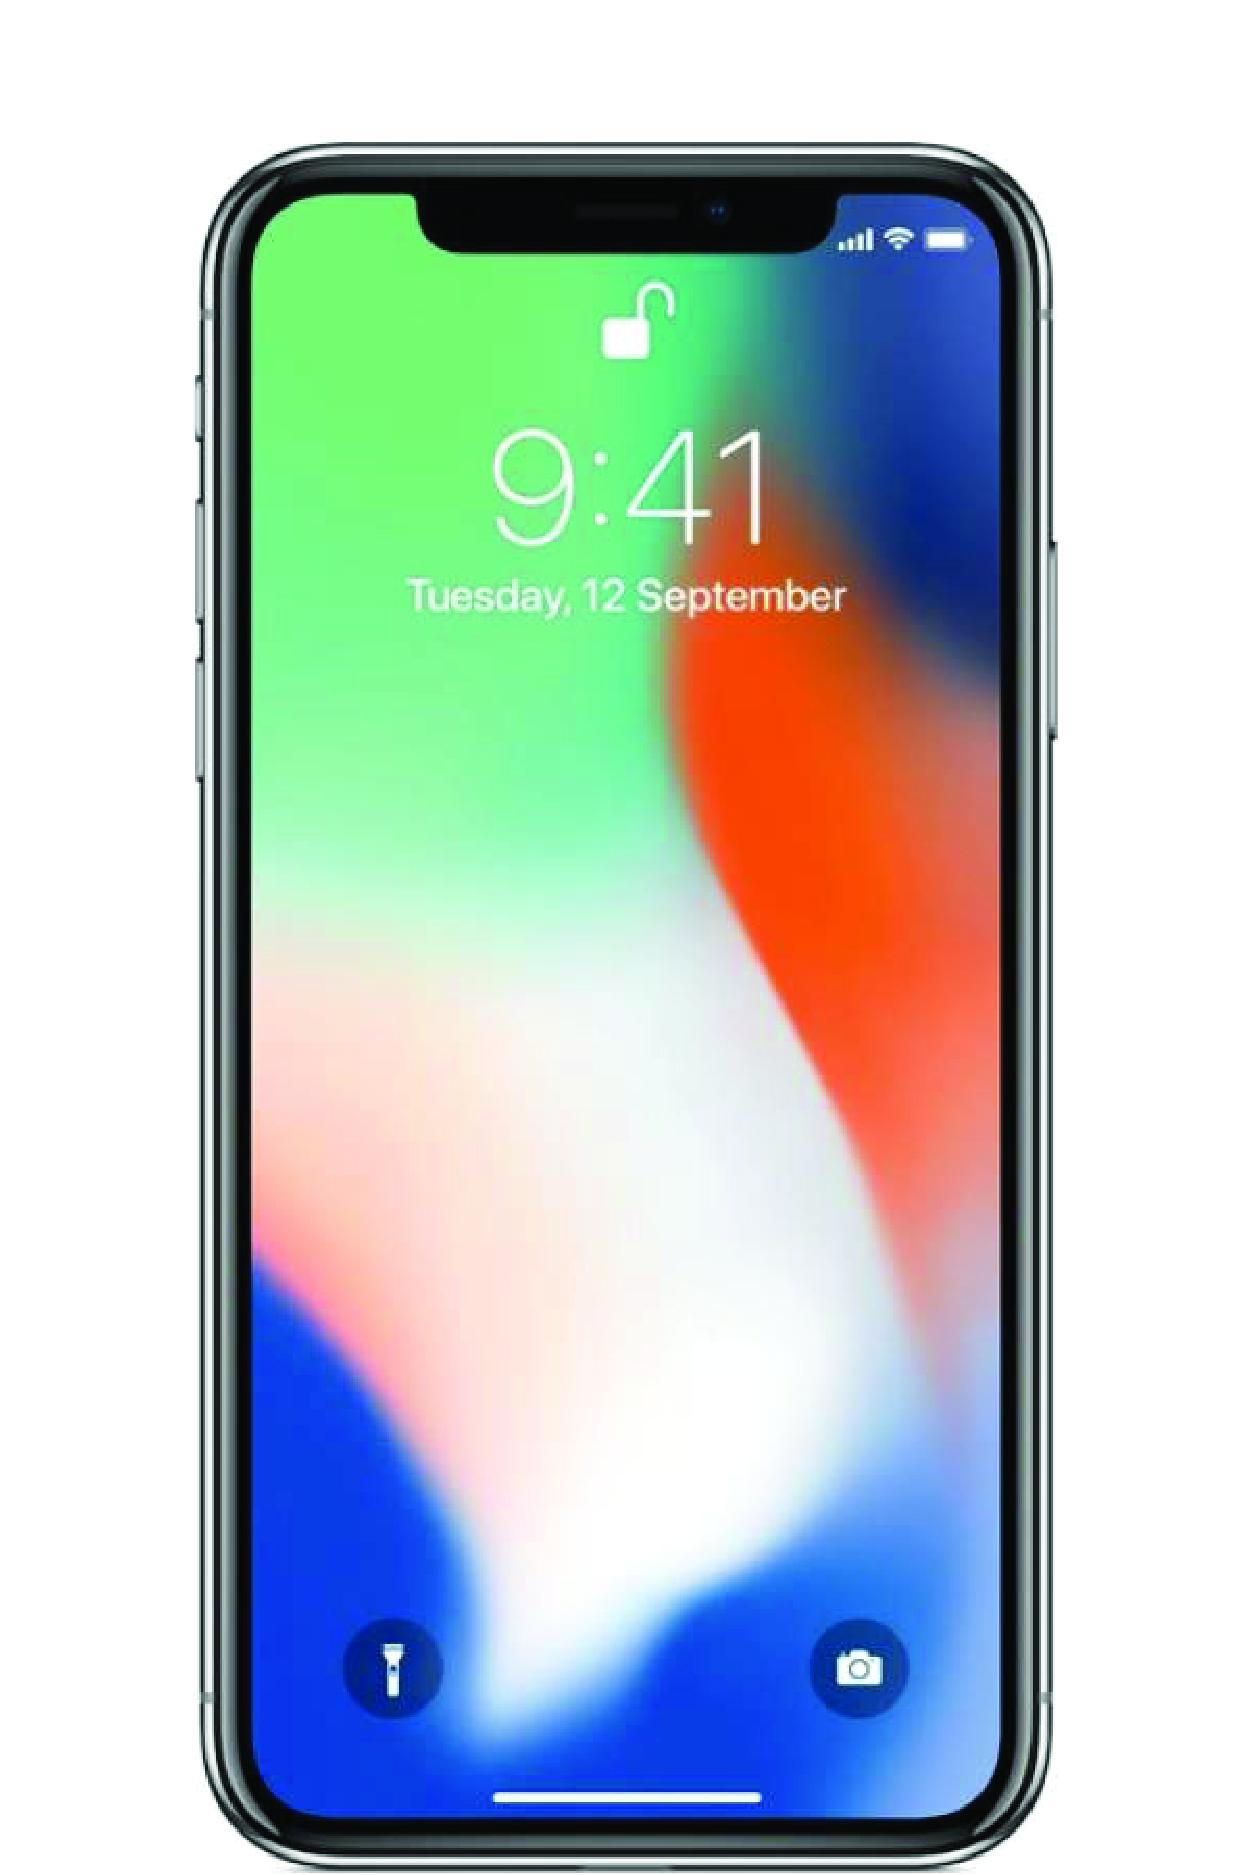 db0cdfeba iPhone X Mobile In India